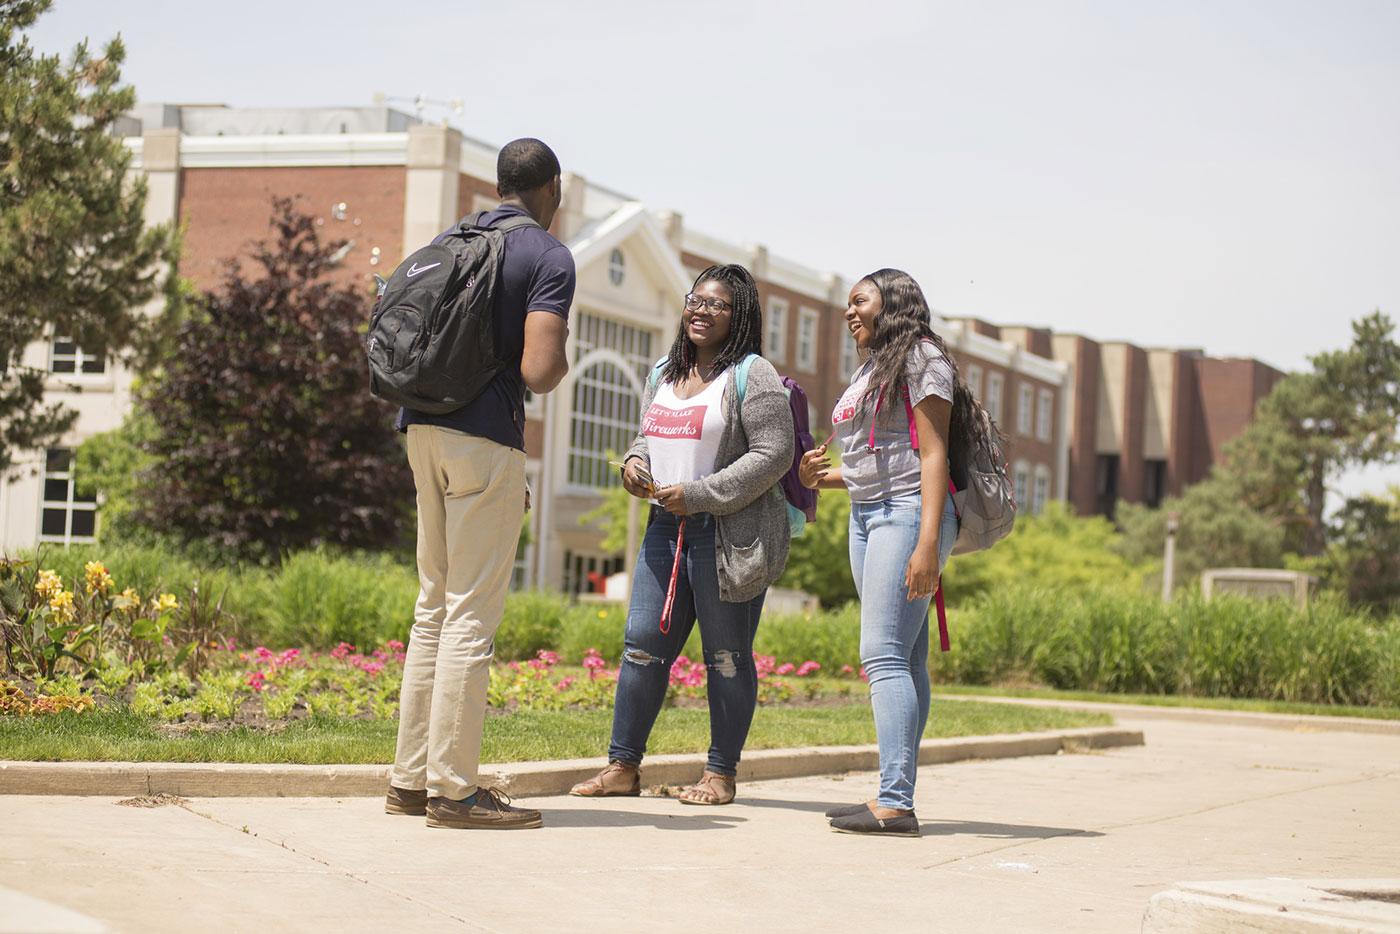 Students on campus at Illinois State University